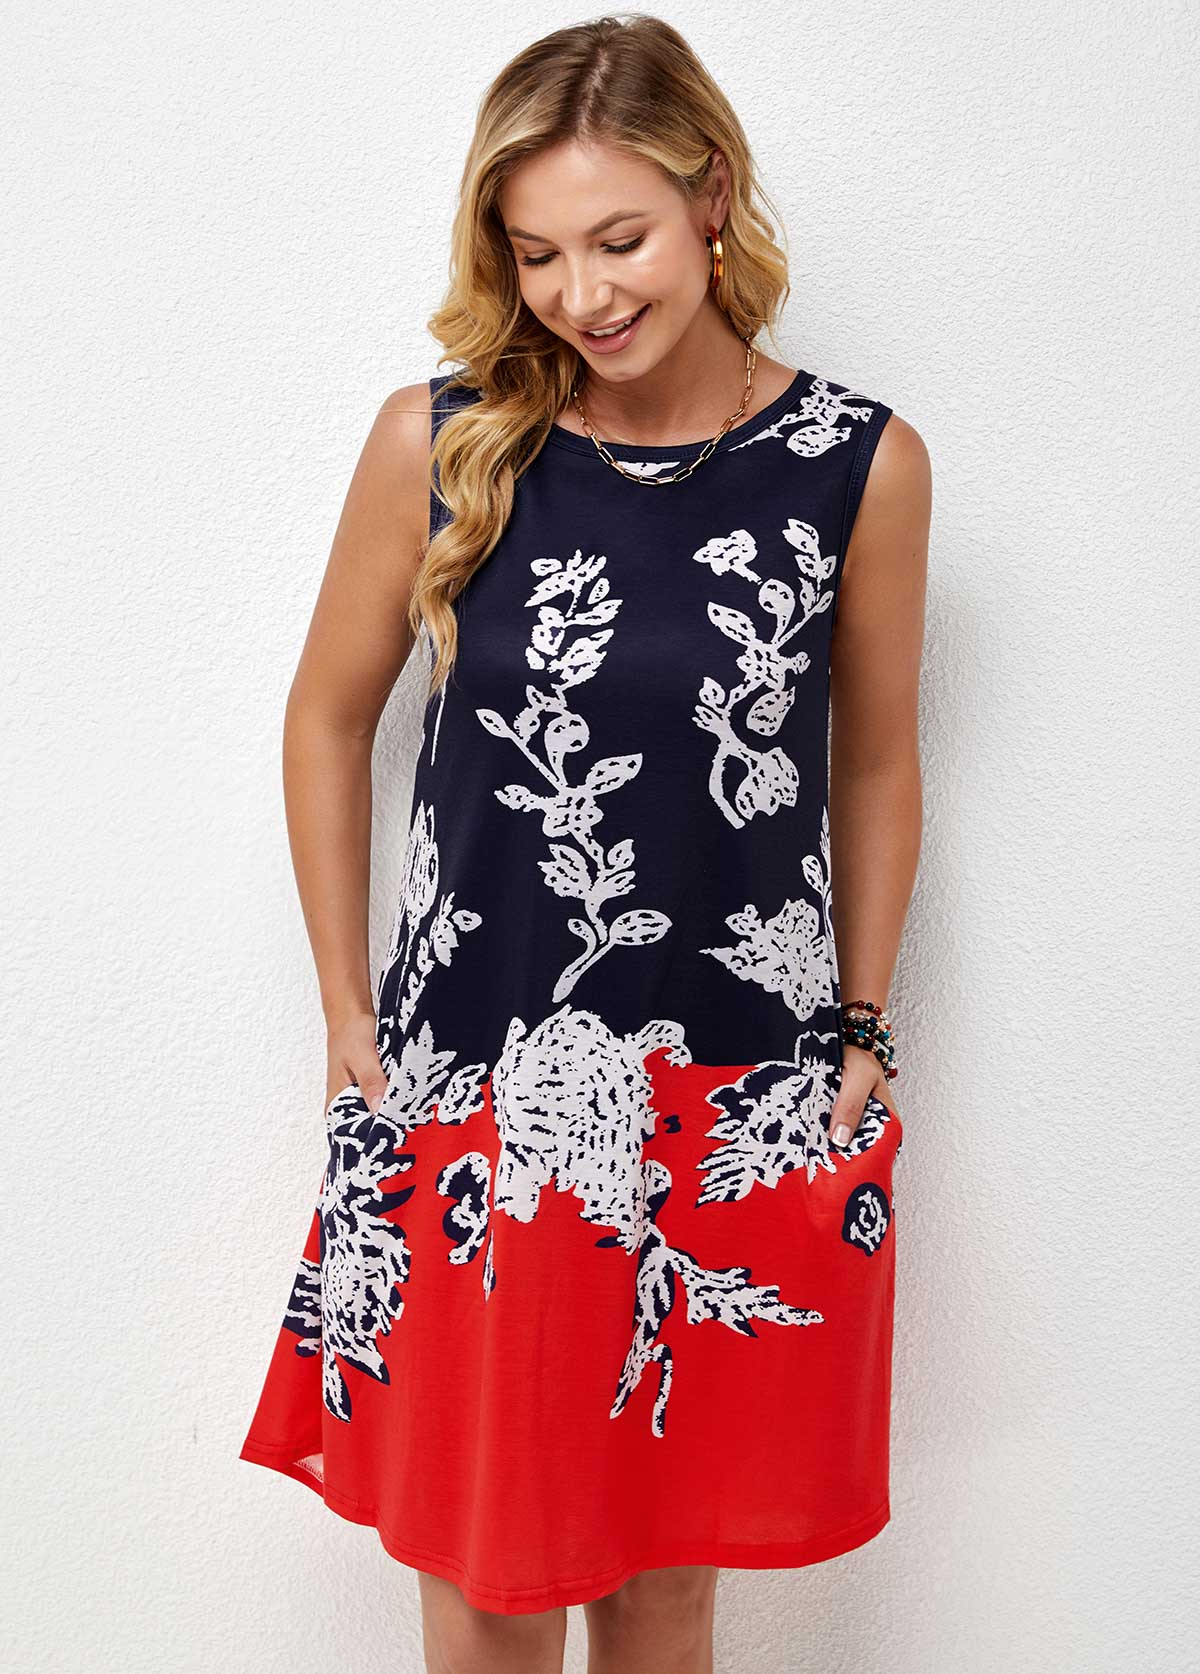 Double Pocket Sleeveless Round Neck Printed Dress